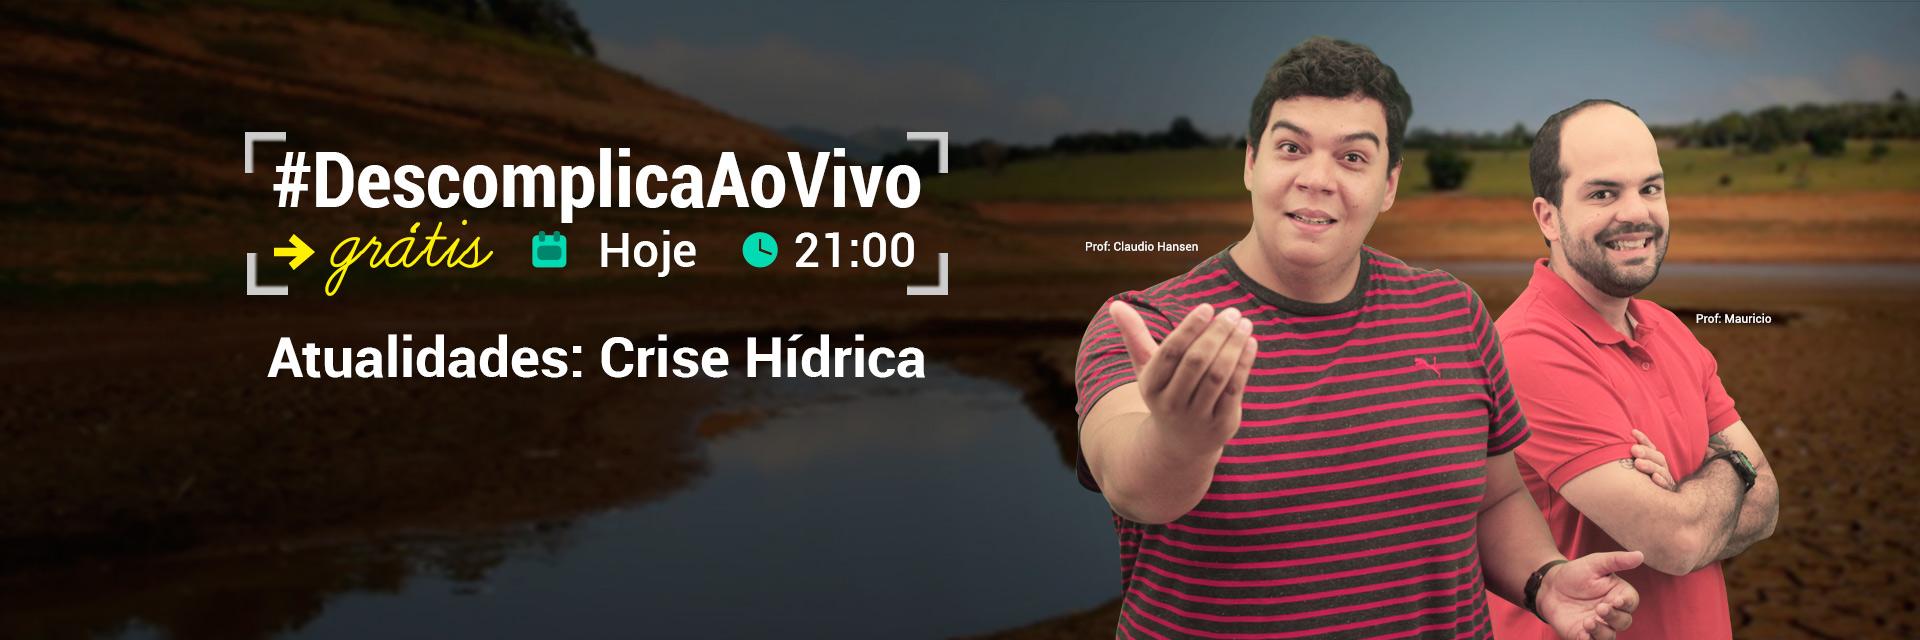 header-de-Blog-1920x640px_Aulaaovivo_Atualidades (2)